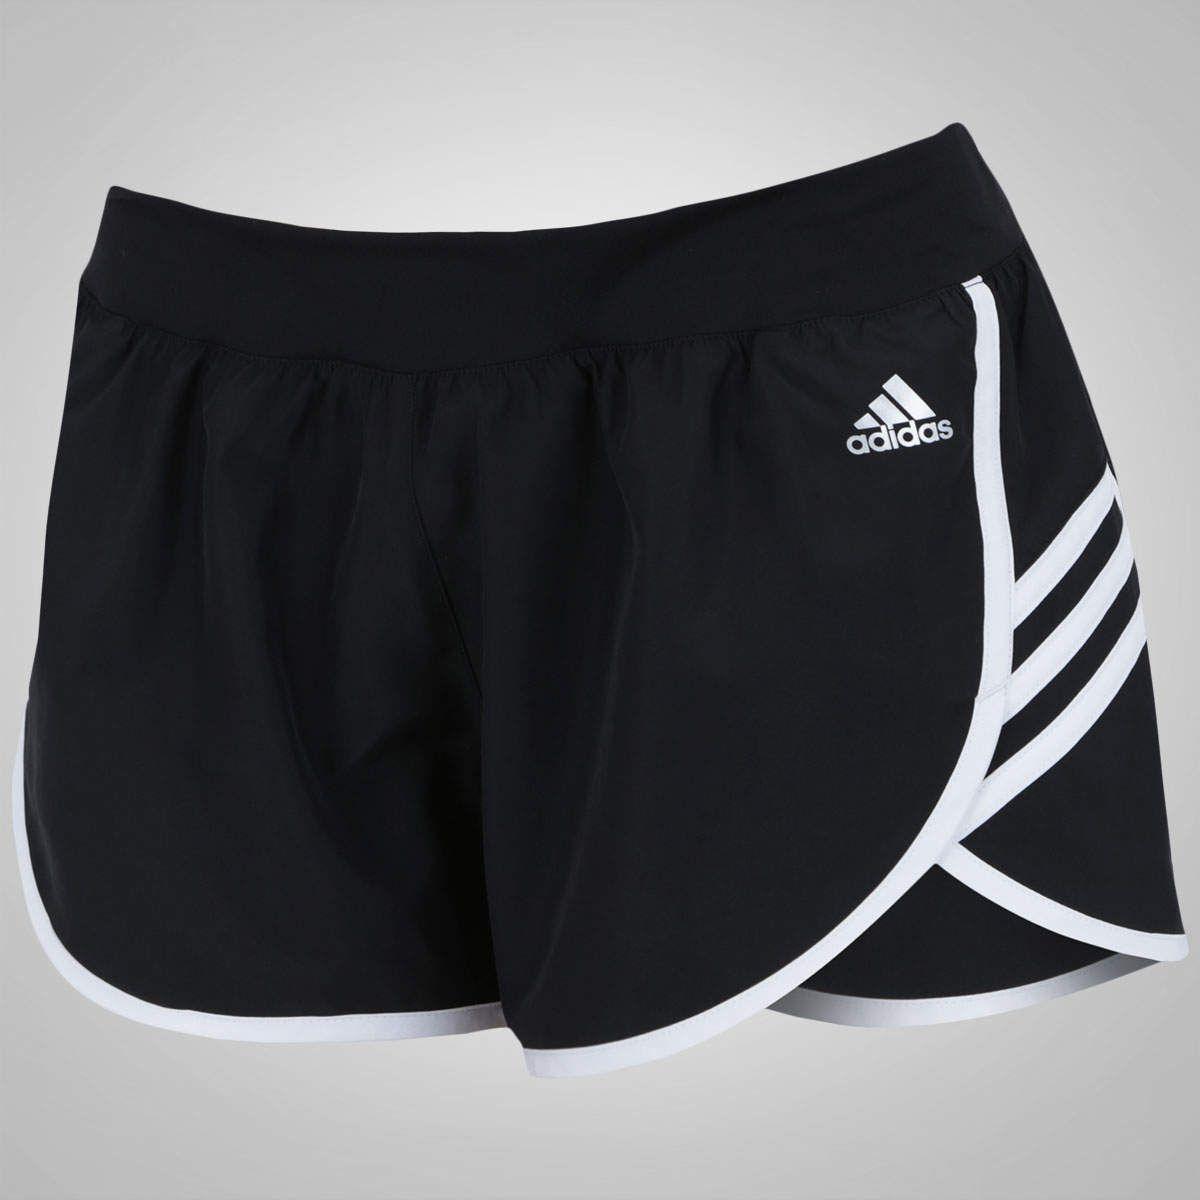 Nominación Pólvora dos  Shorts adidas Ultimate WVN 3S - Feminino | Roupas nike, Roupas adidas,  Roupas